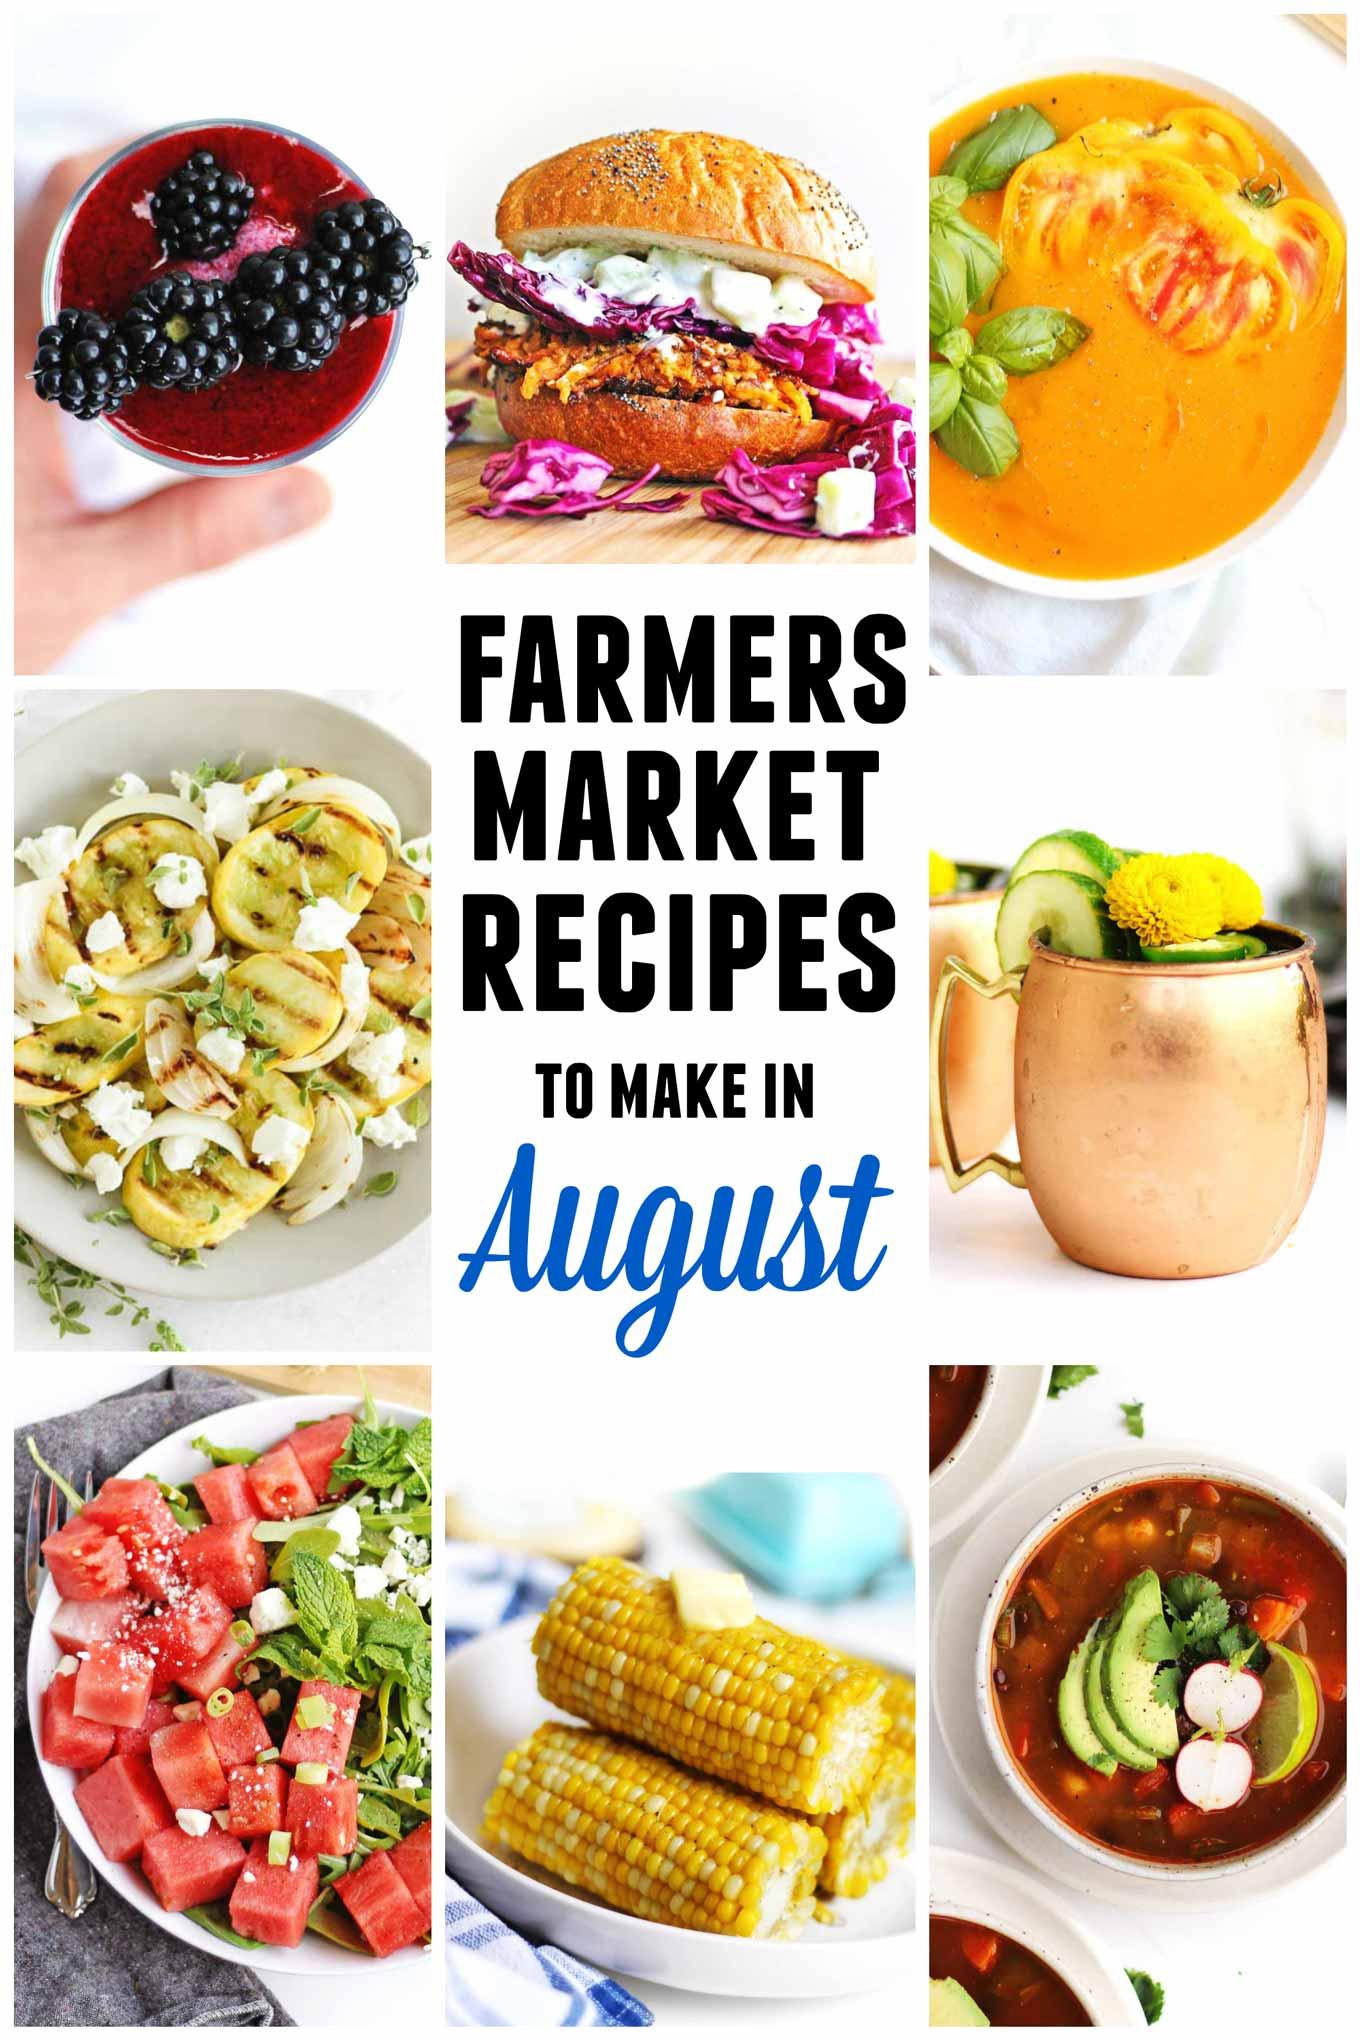 Farmers market August recipes